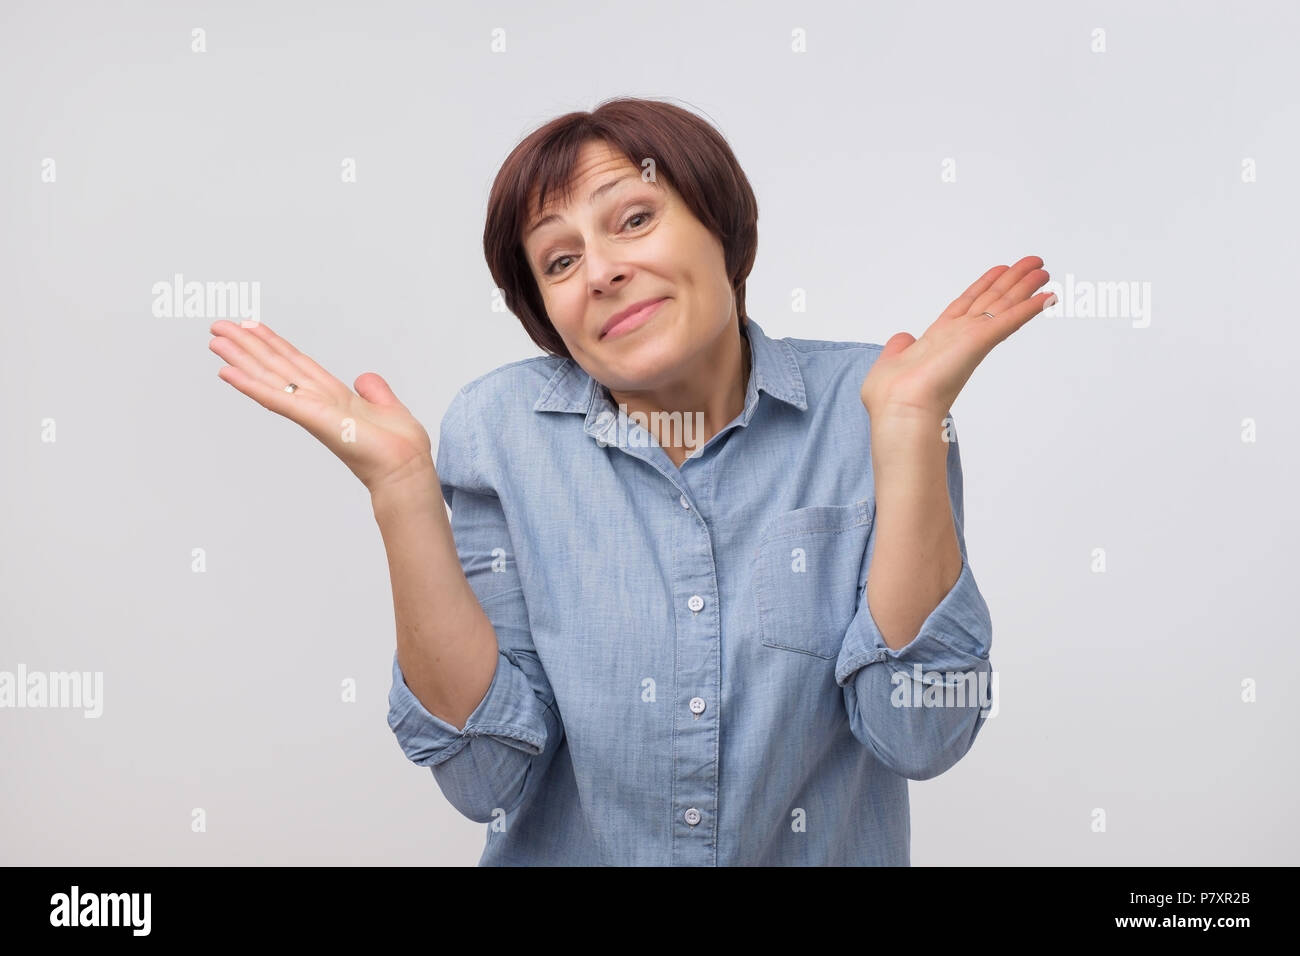 Zuckend reife Frau im Zweifel an Kamera suchen Stockbild